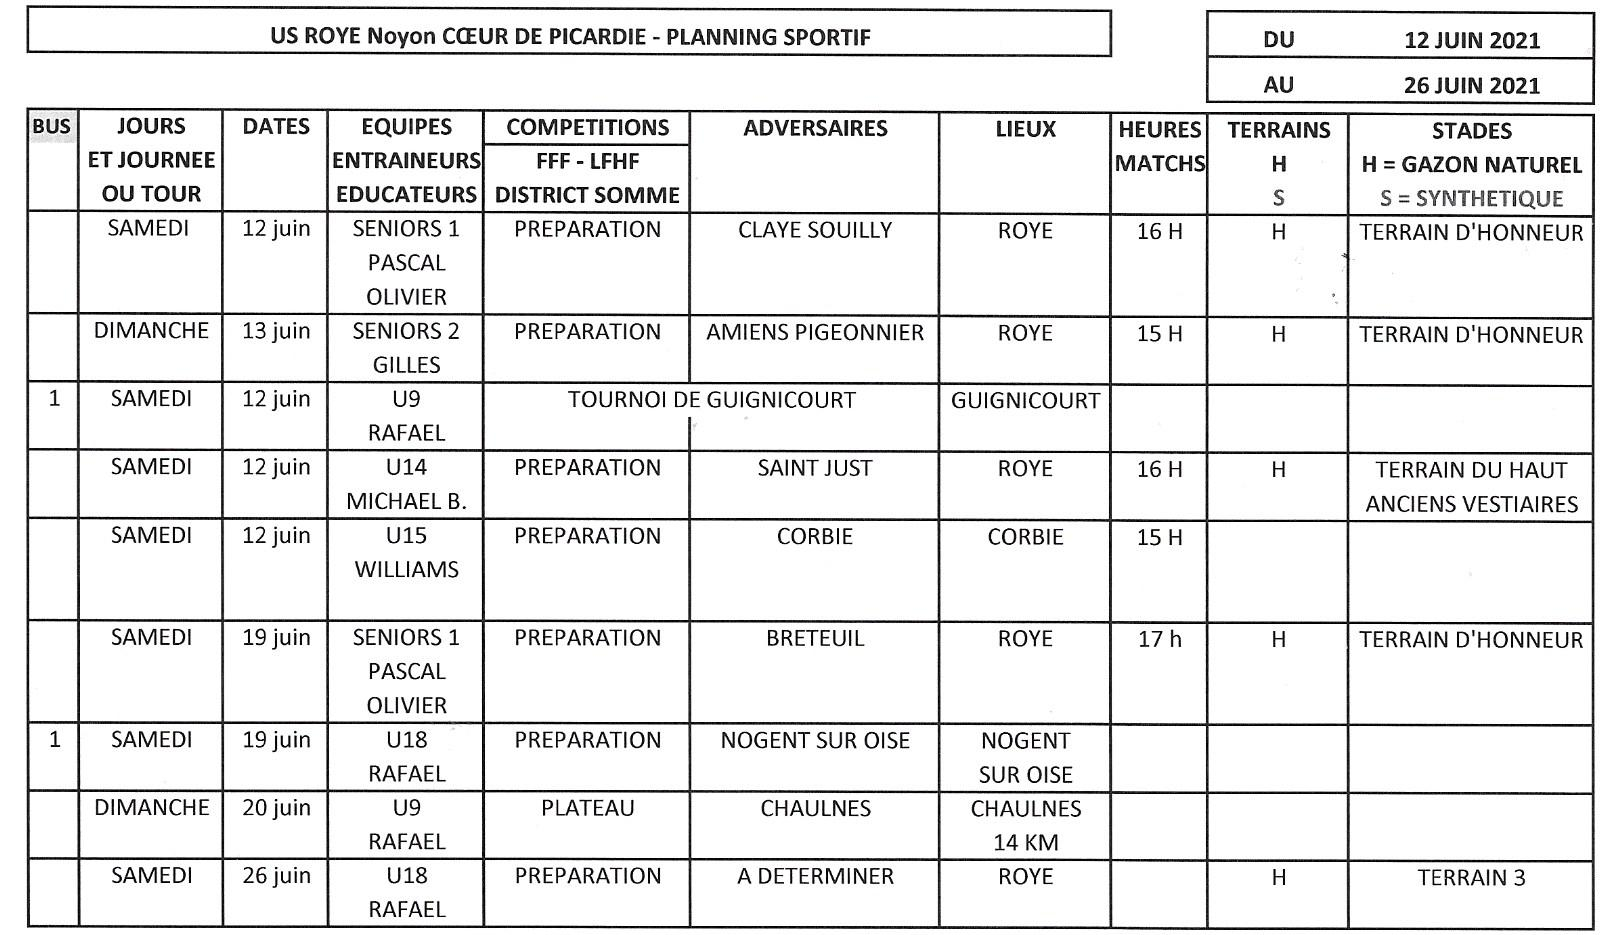 Planning sportif 2